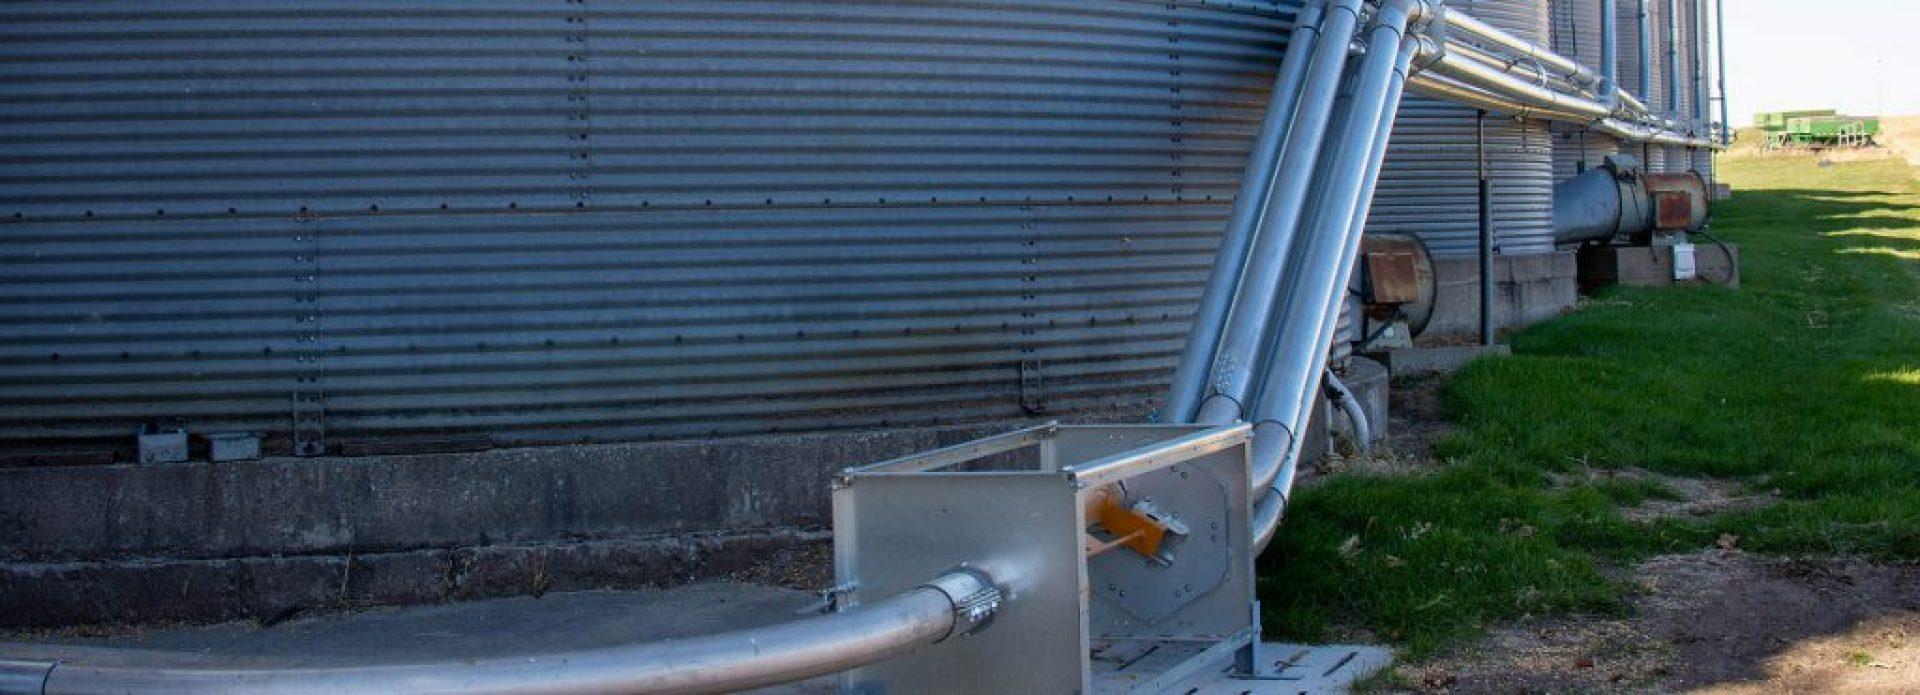 Eldon-C-Stutsman-Inc-Grain-Handling (5)